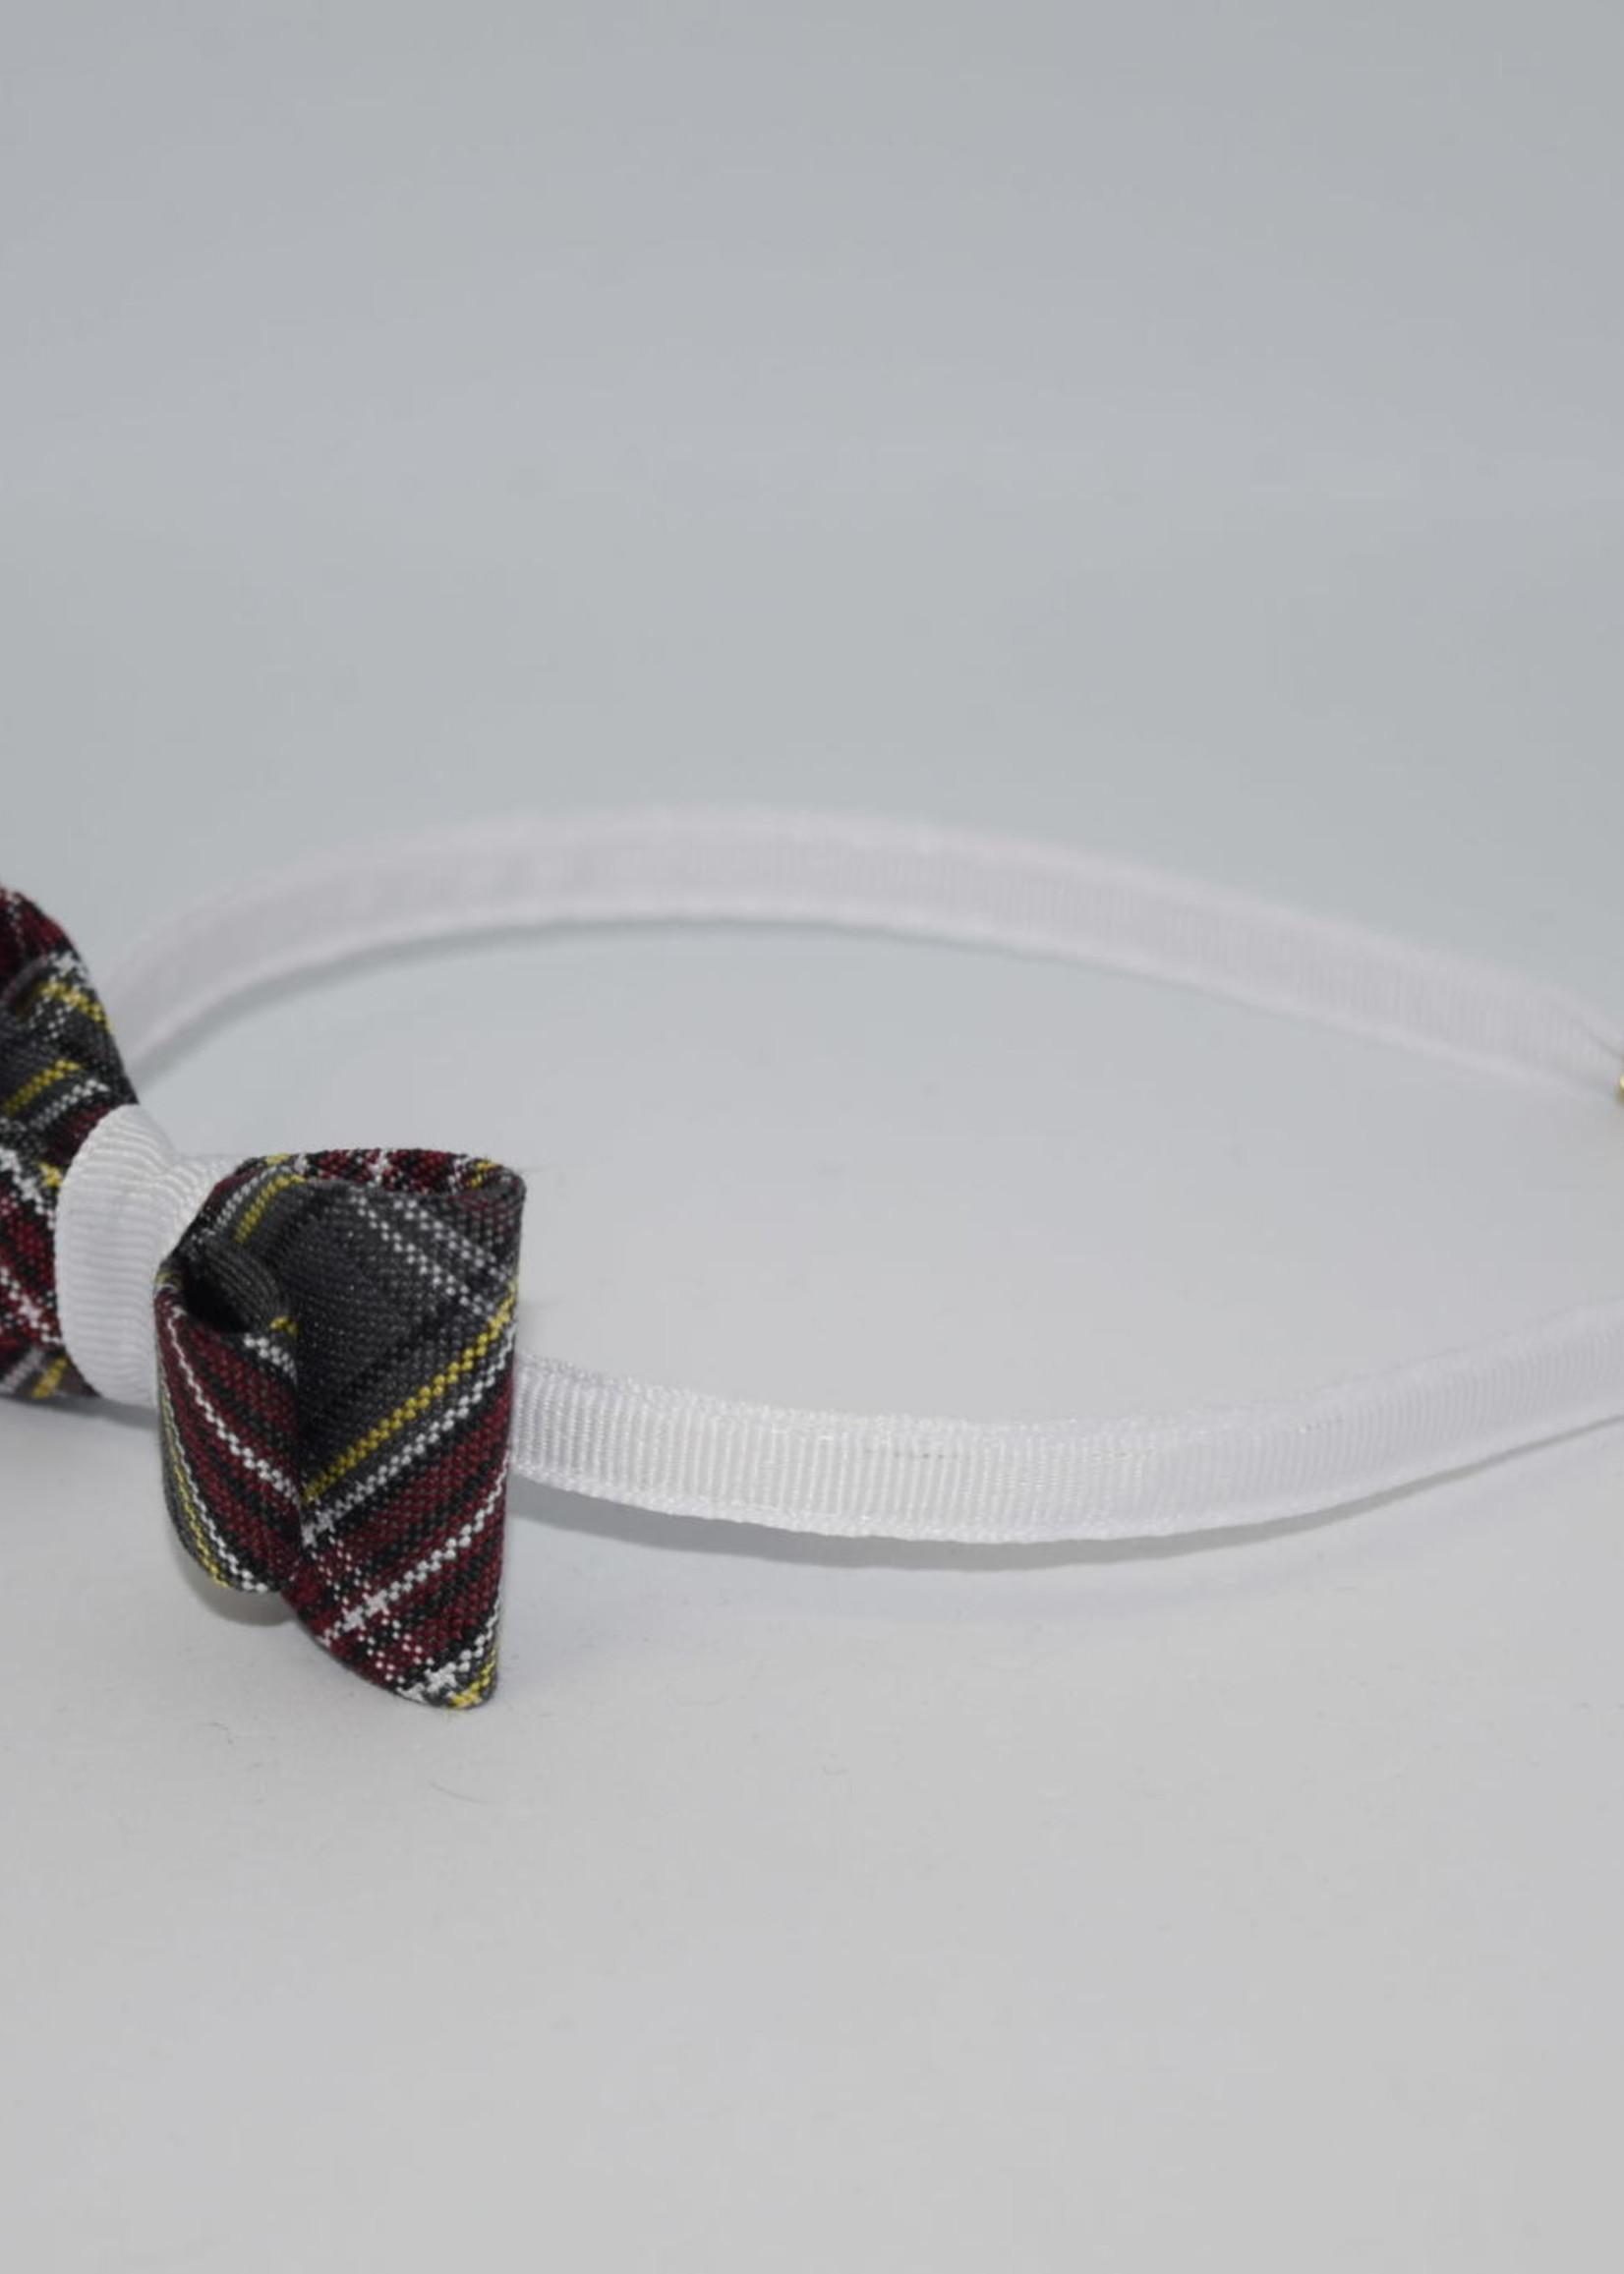 Double Tailored Ponytail Bow on Headband P43 WHT